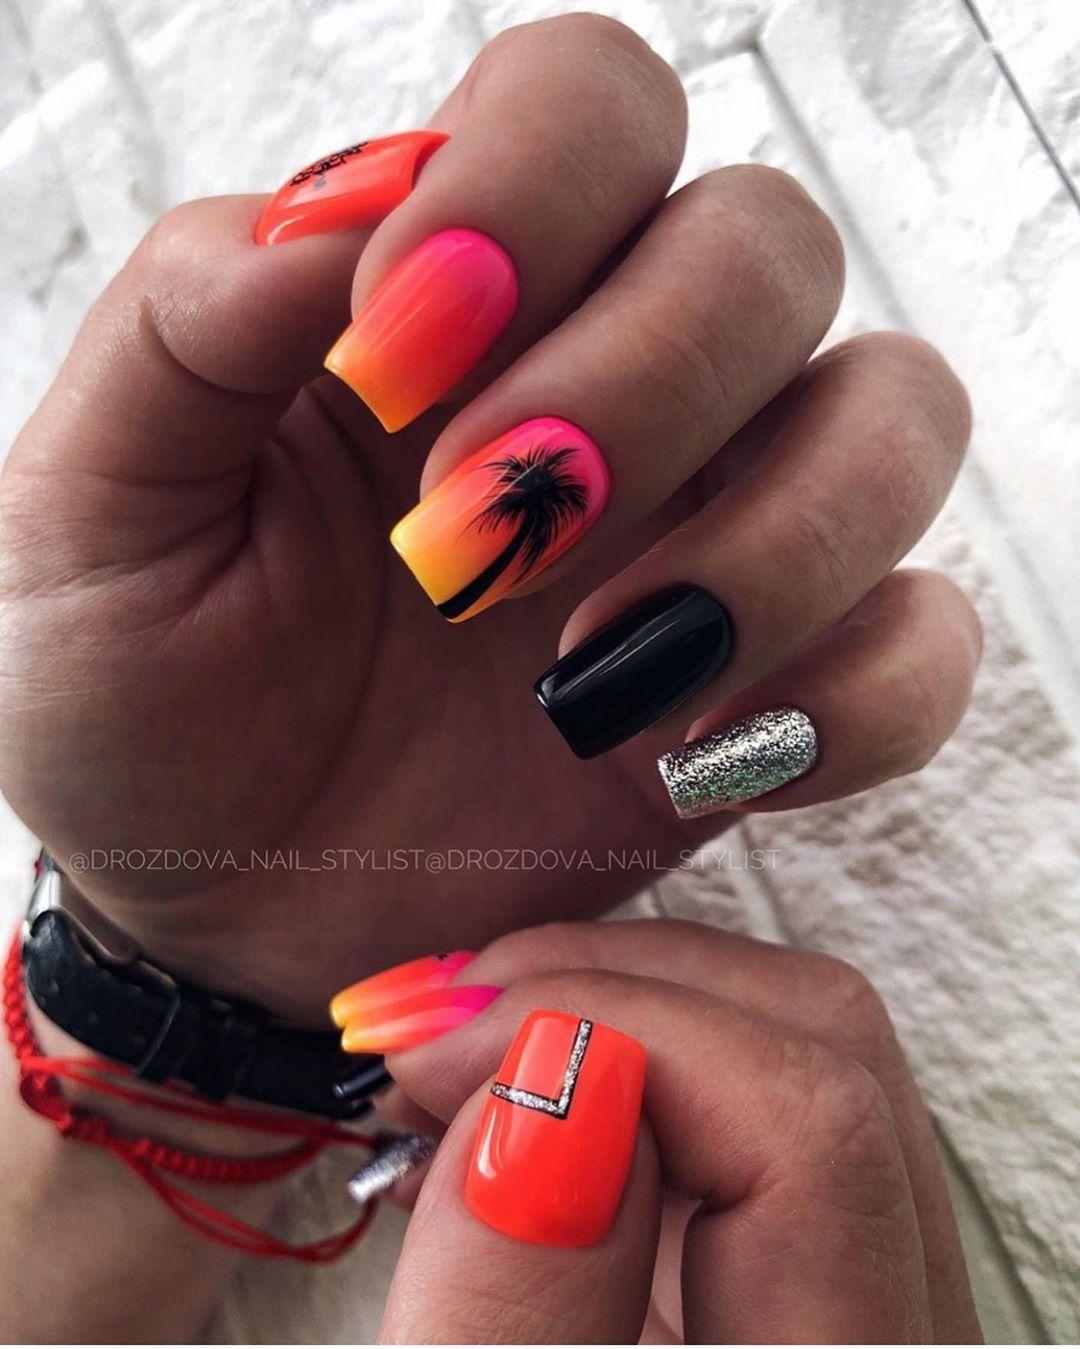 @drozdova_nail_stylist